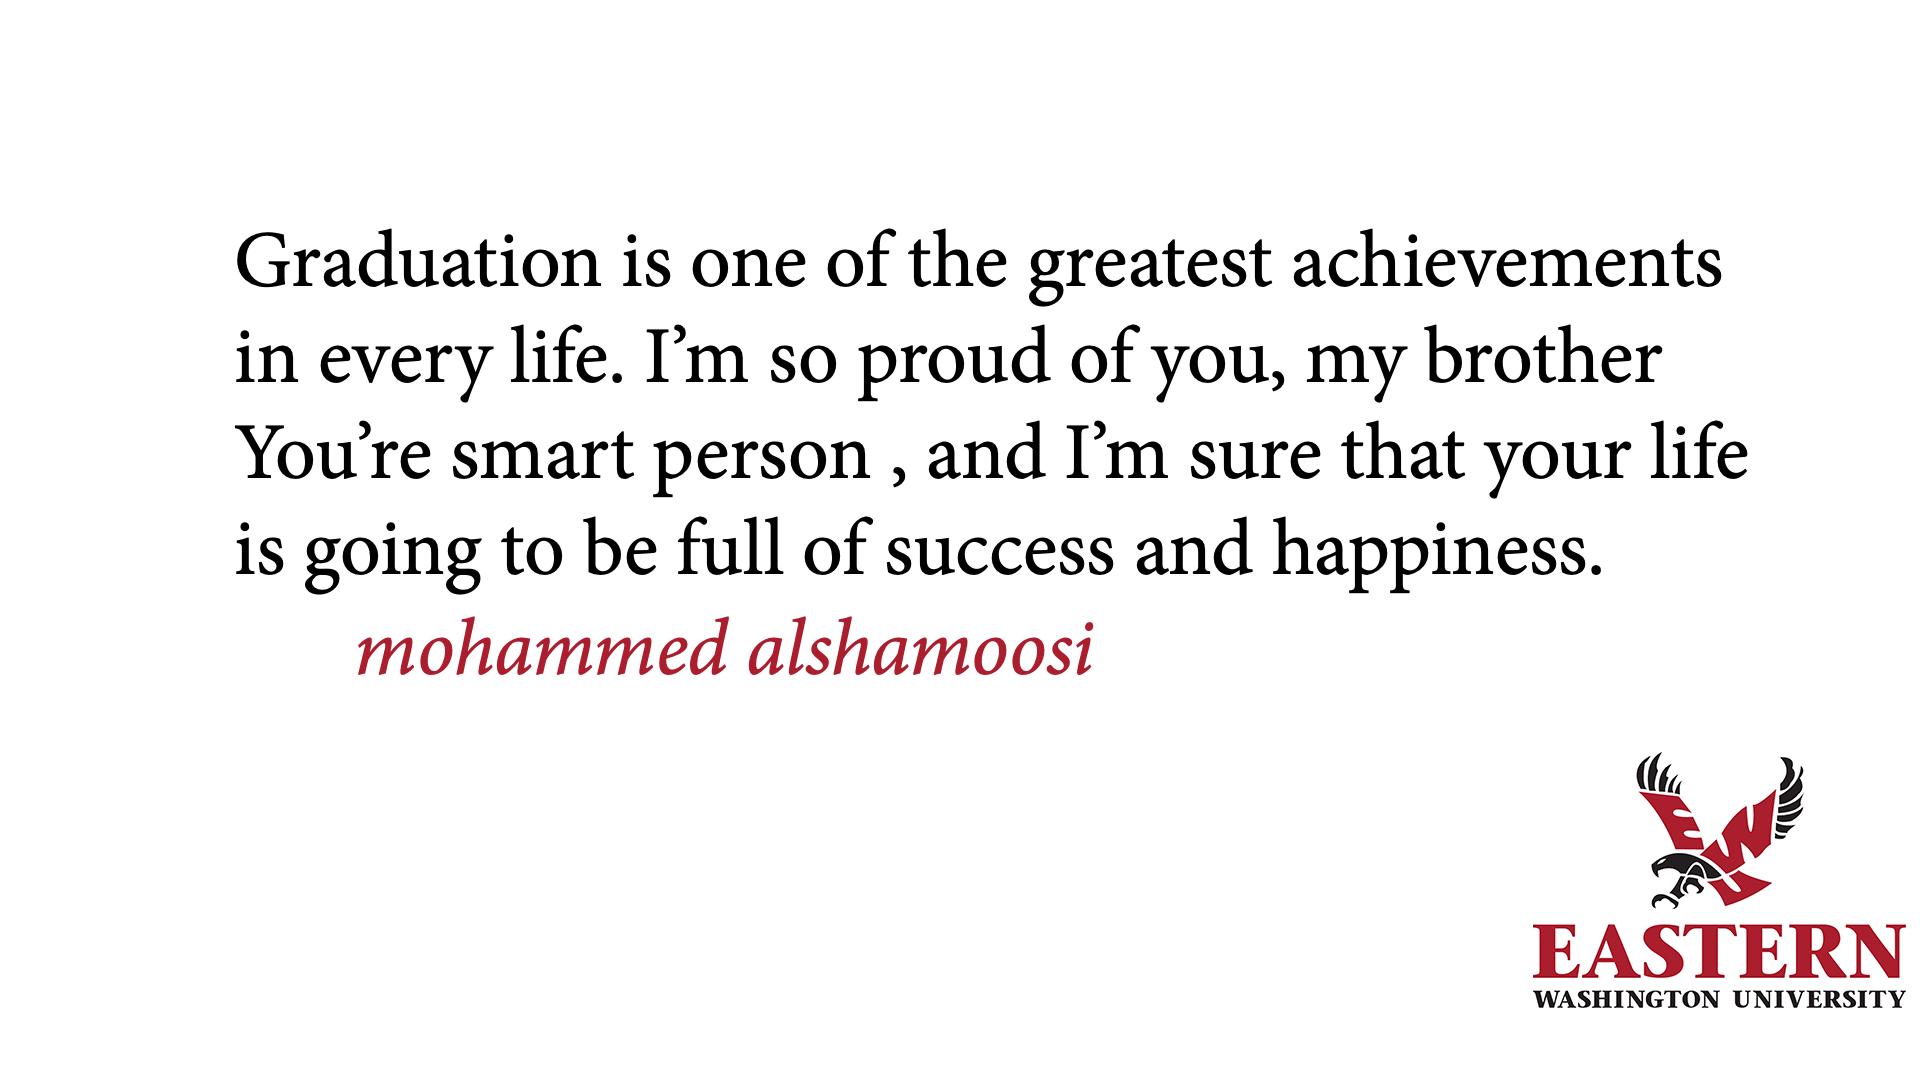 tbi_abdulrahman-alshamoosi_3064.png